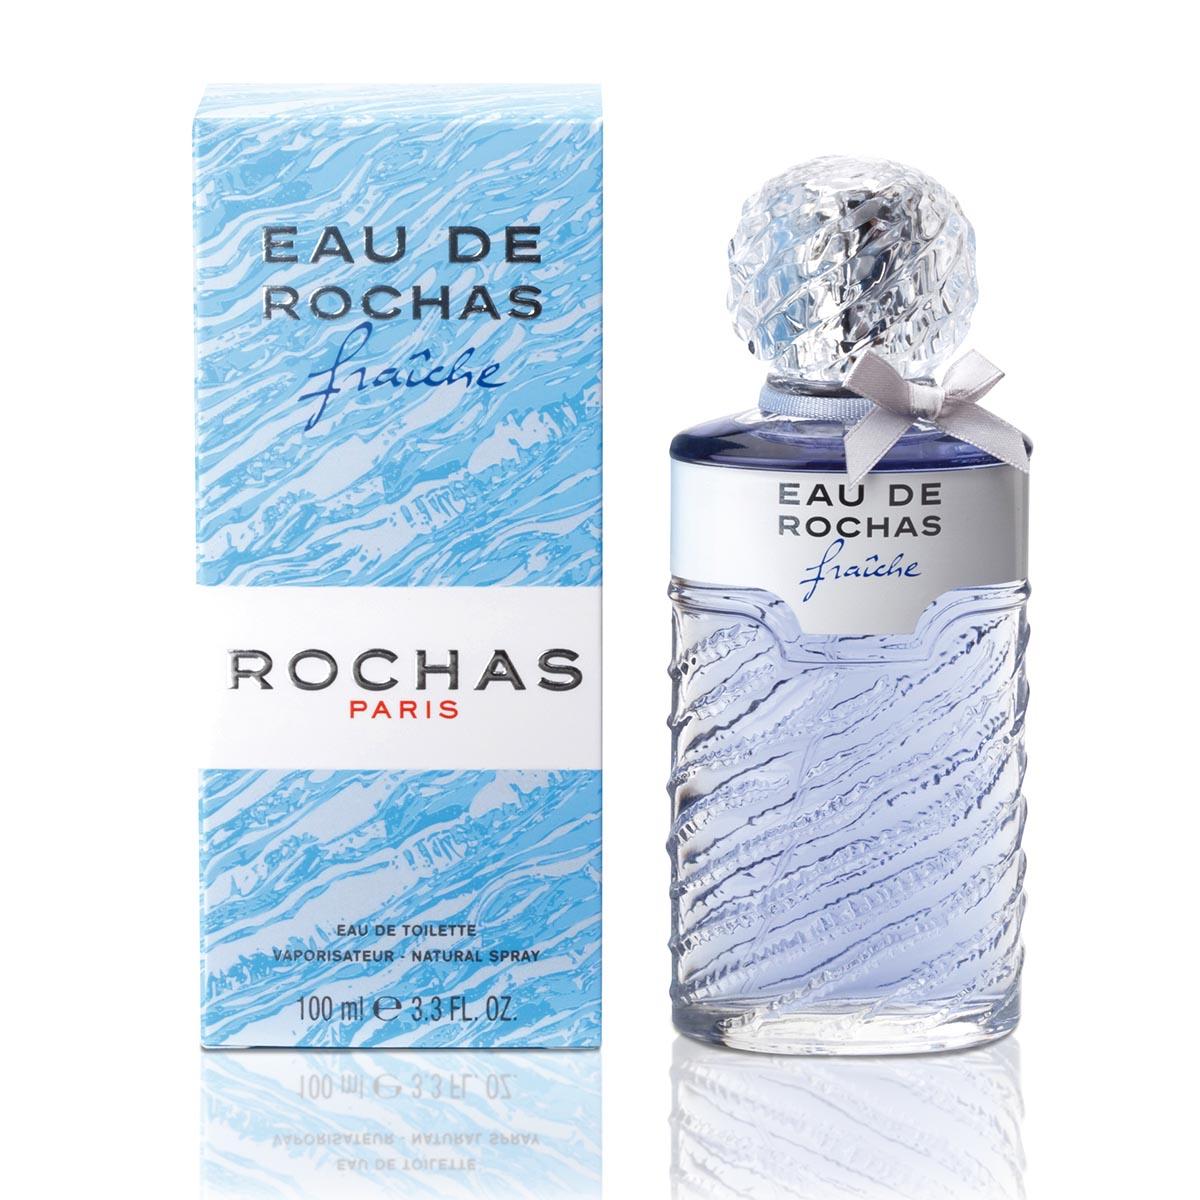 EAU DE ROCHAS FRAICHE 3.4 EAU DE TOILETTE SPRAY FOR WOMEN